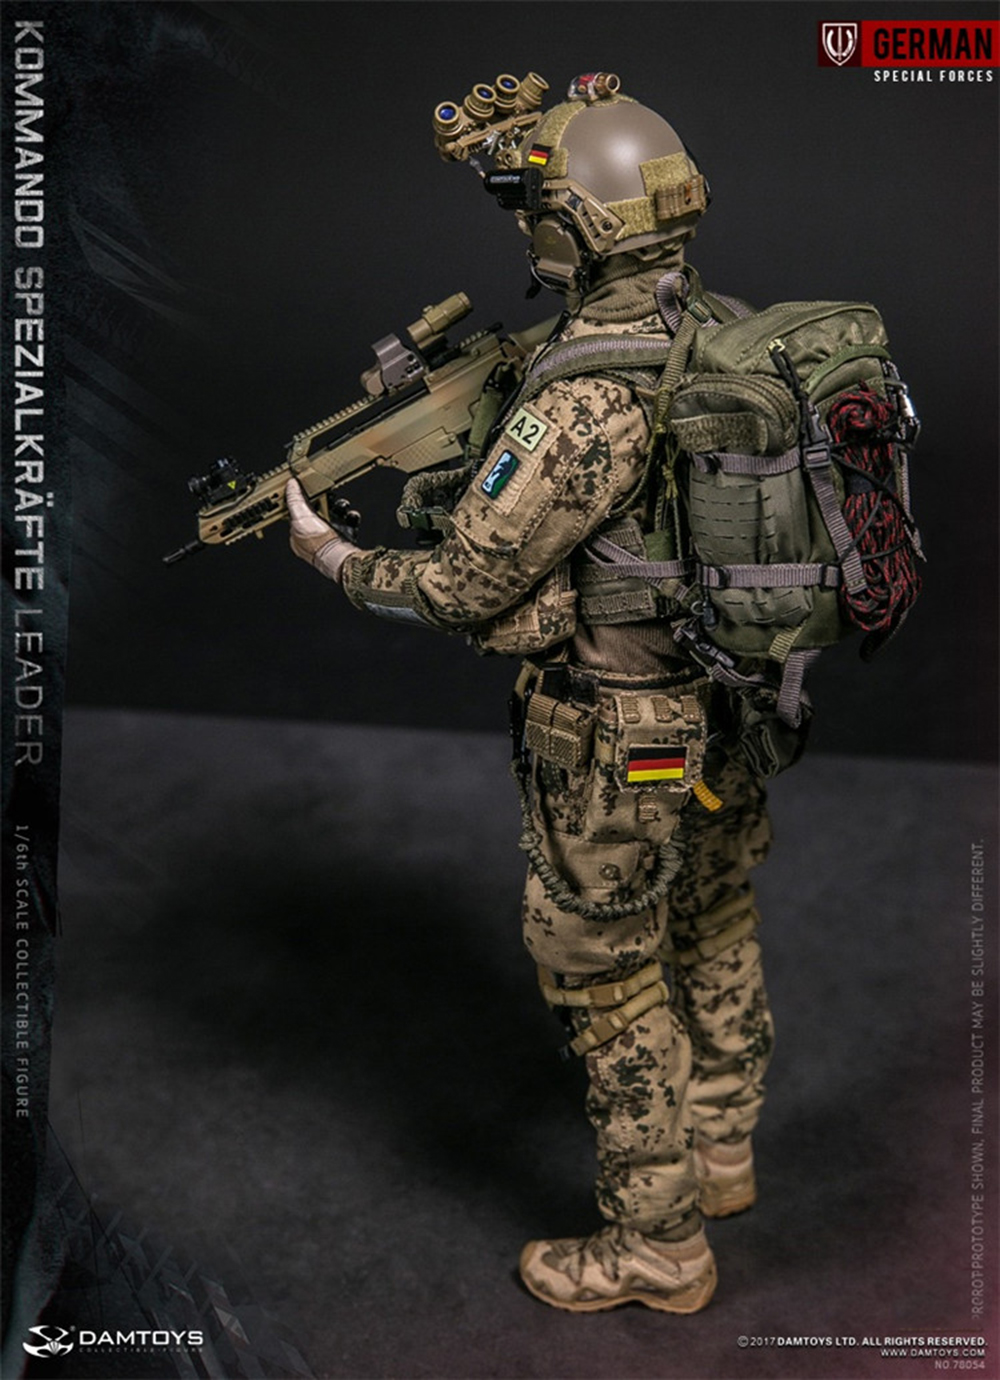 Kommando Spezialkrafte Marine-Fournitures médicales 1//6 Scale-Soldier Story